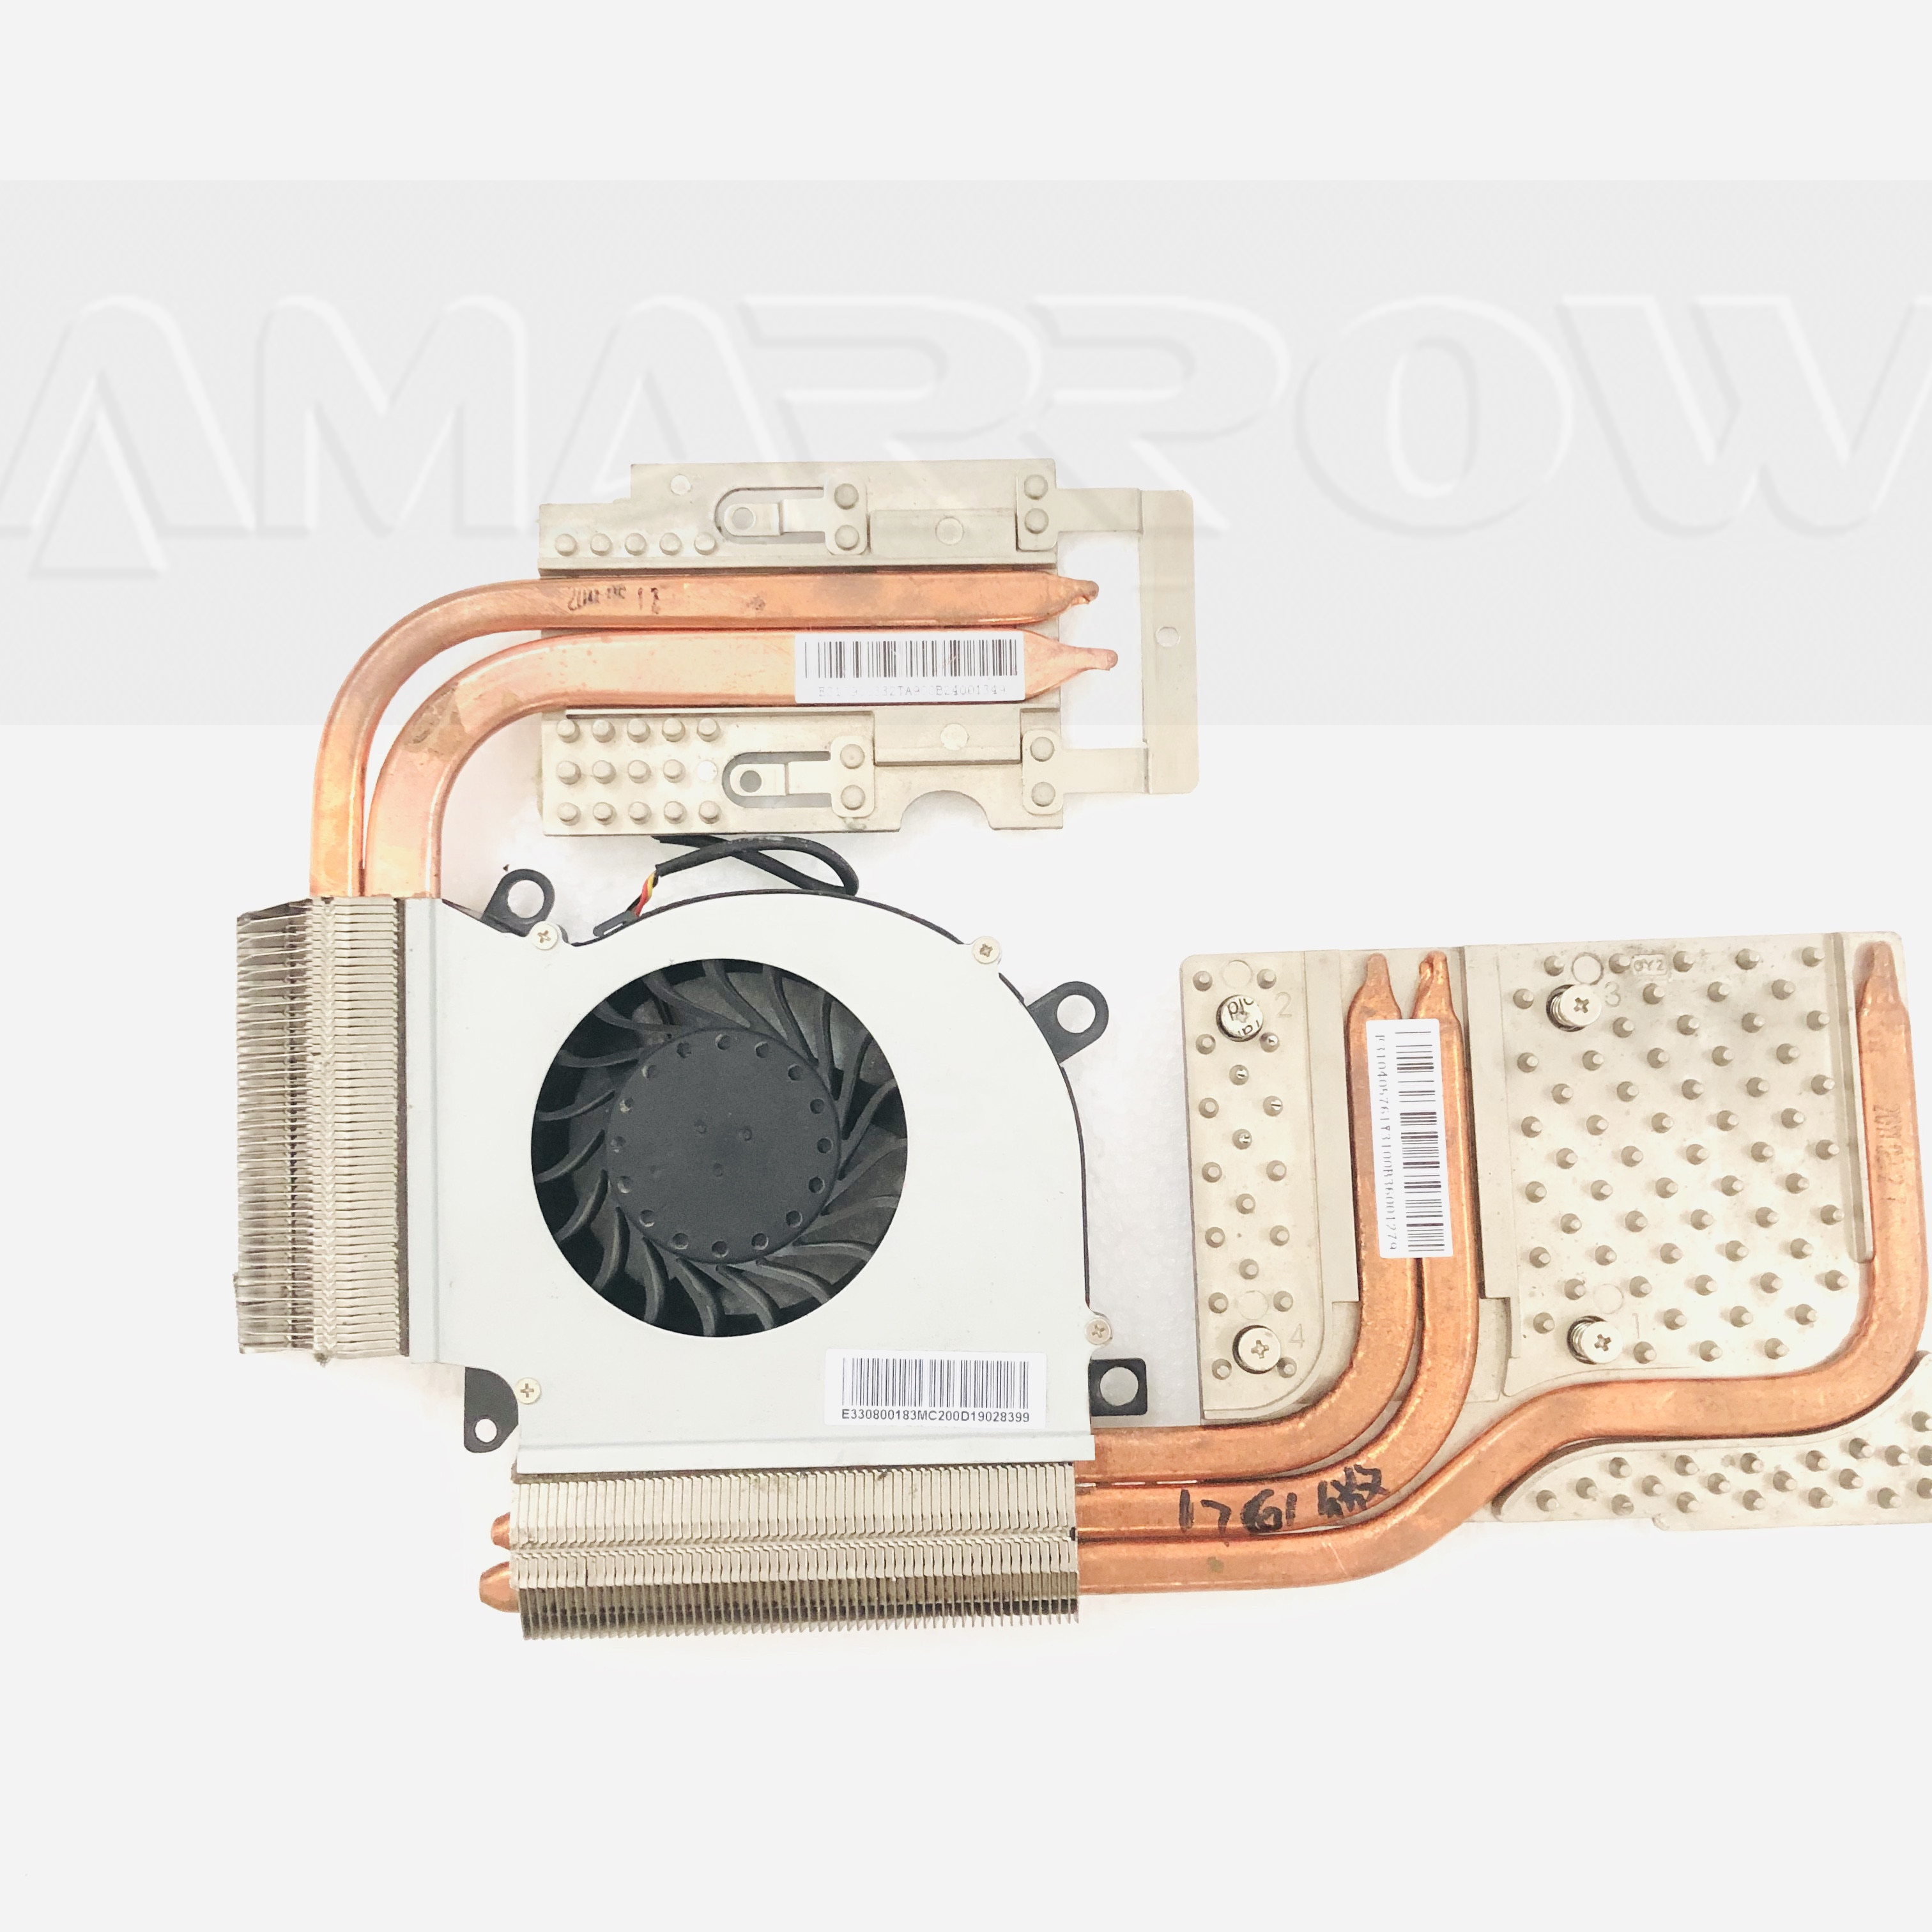 Original laptop heatsink cooling fan CPU cooler GPU cooler For MSI GT60 MS-16F3 MS-1762 GT70 GT780 1761 1762 GPU cooler heatsink